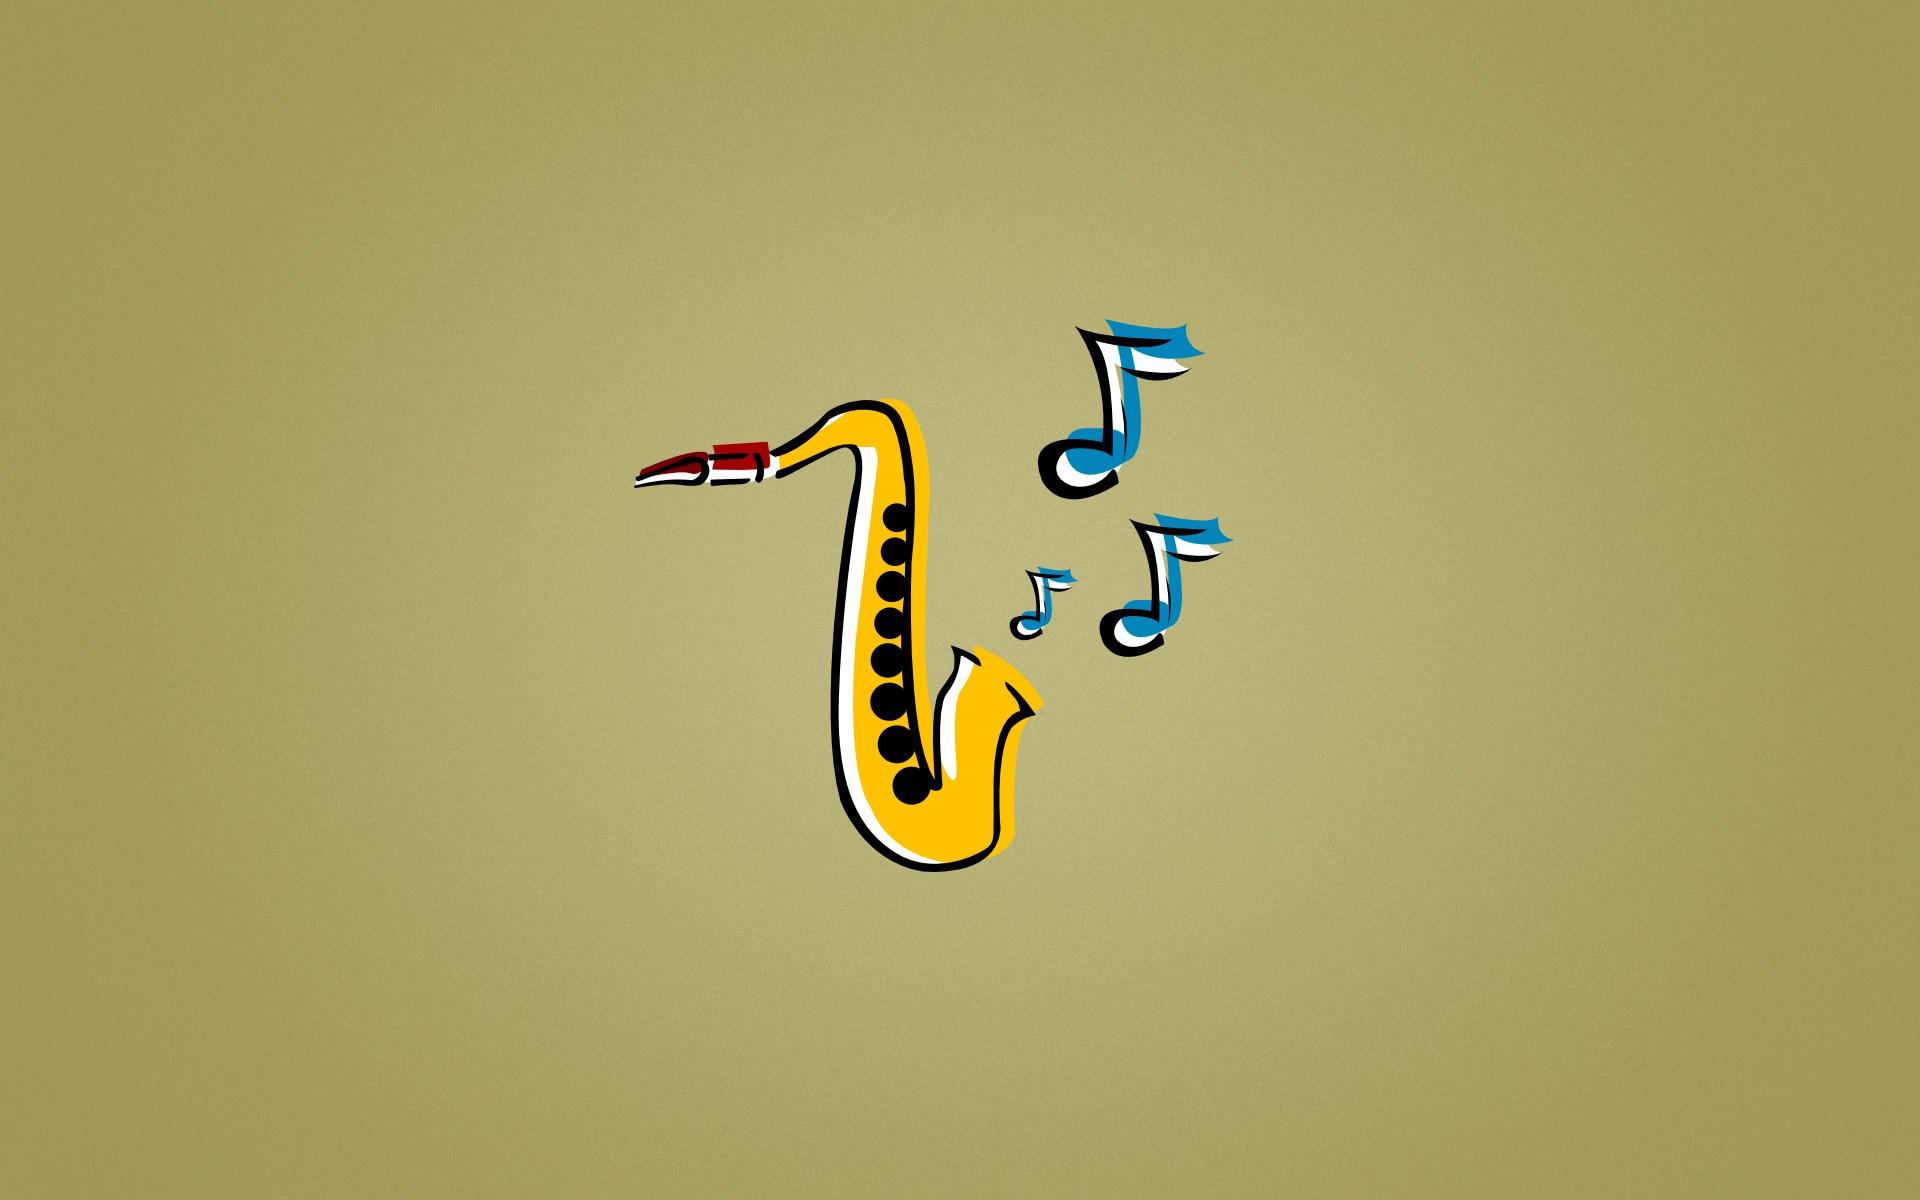 Saxophone Sax Jazz Music Art